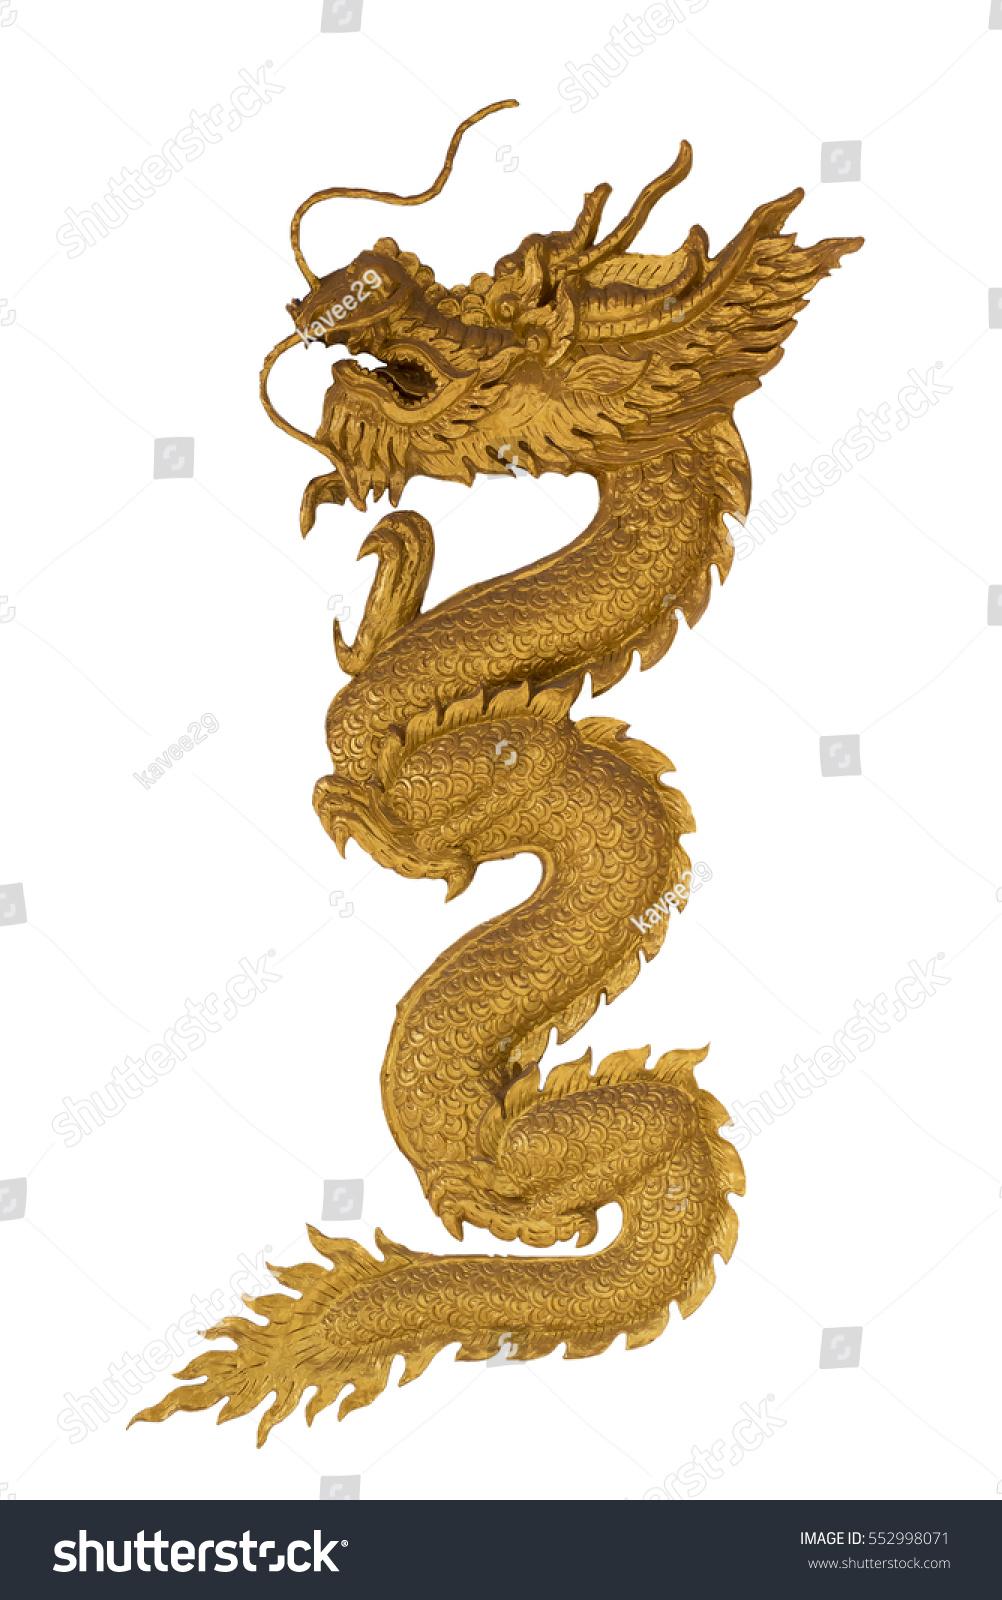 Golden dragon symbol powergolden dragon on stock photo 552998071 the golden dragon is the symbol of powergolden dragon on white background chinese biocorpaavc